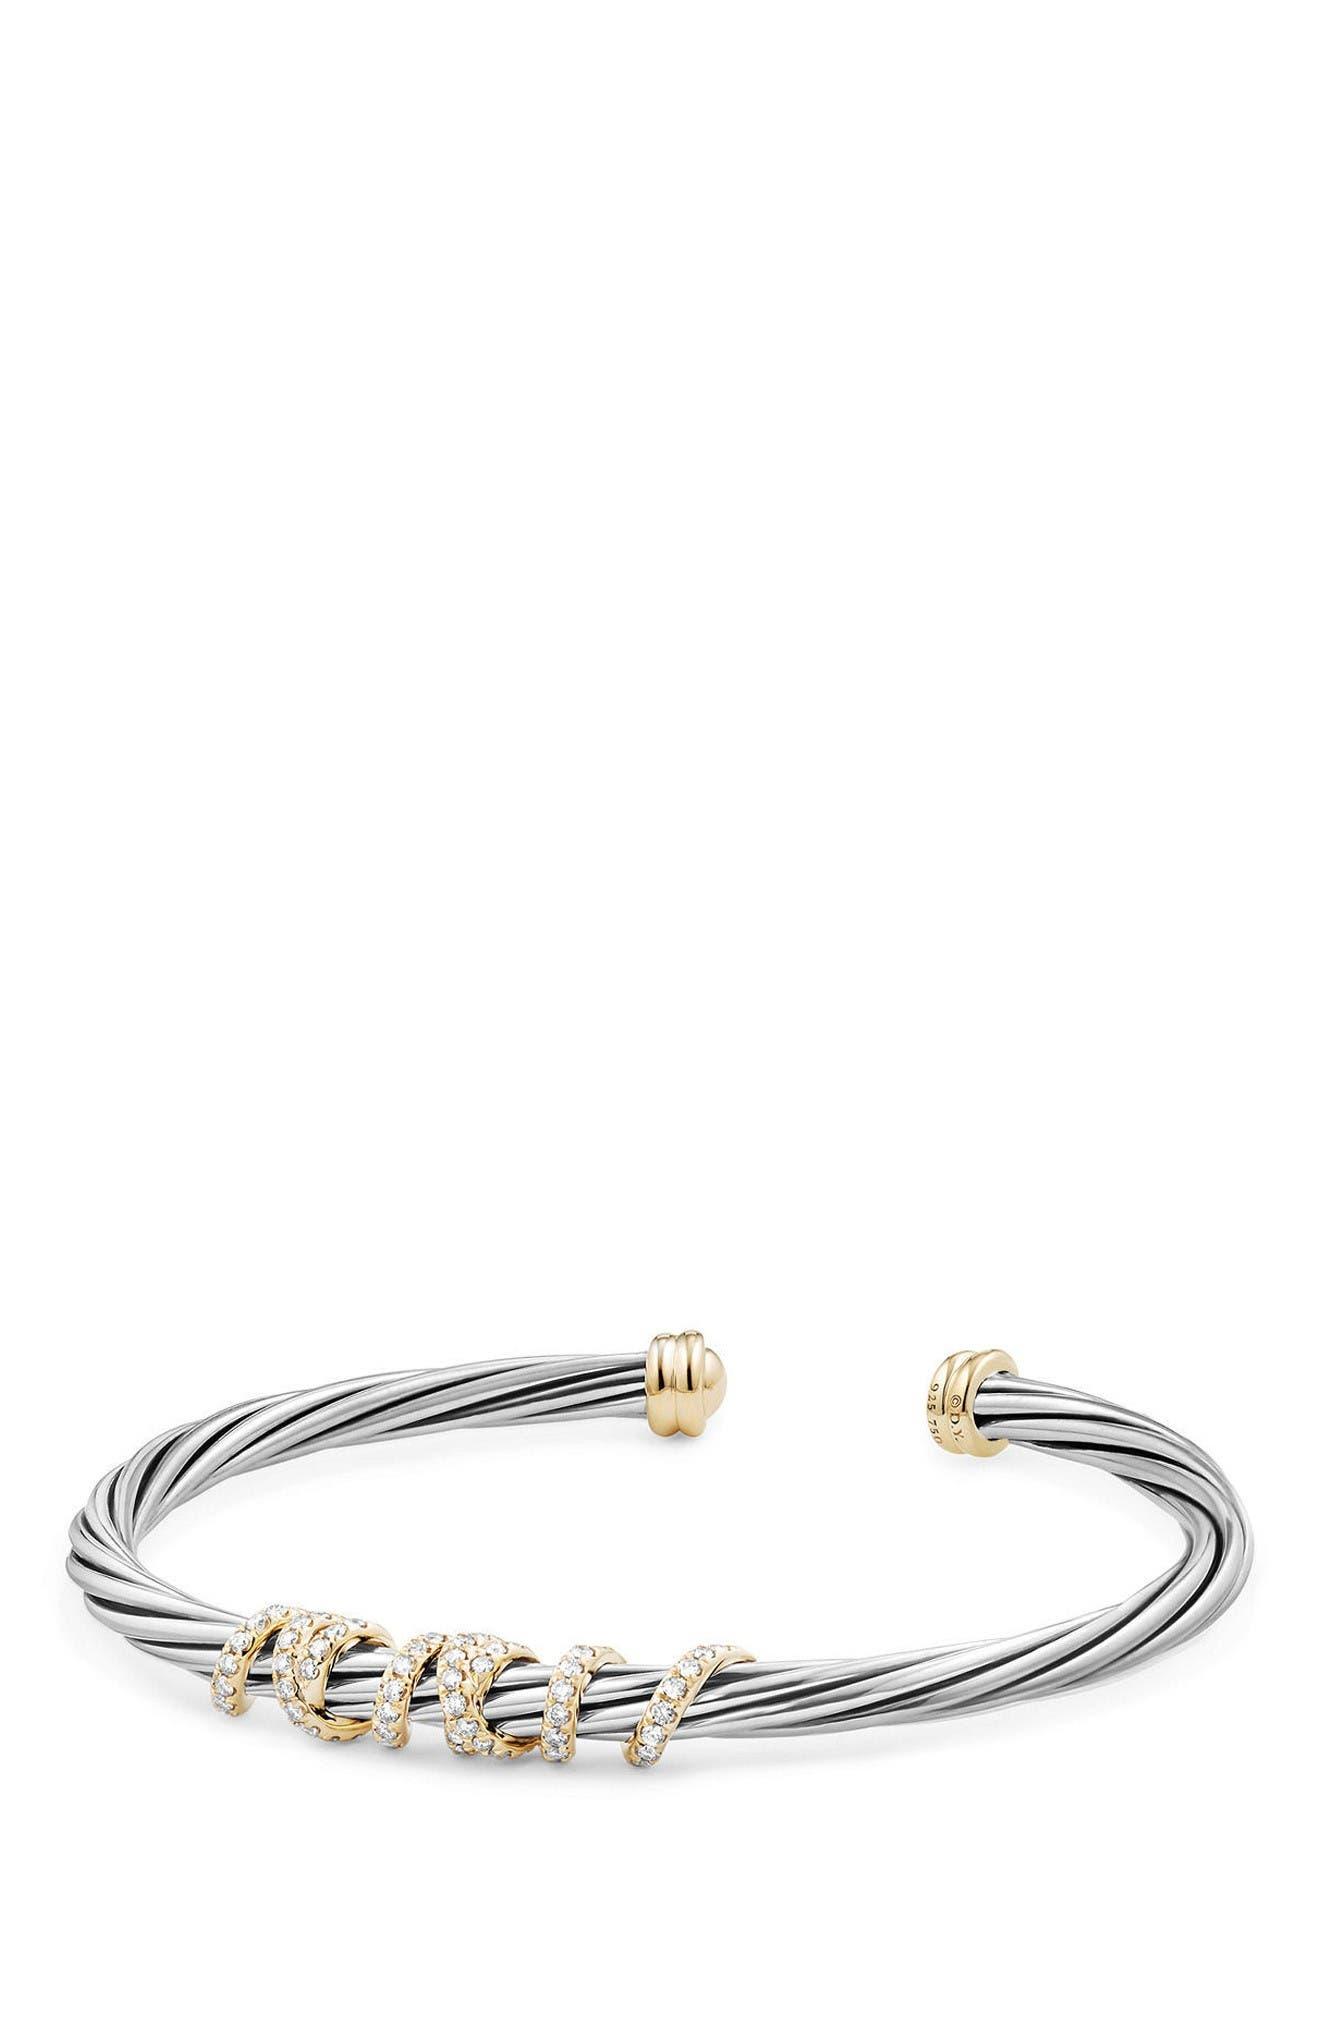 Main Image - David Yurman Helena Center Station Bracelet with Diamonds and 18K Gold